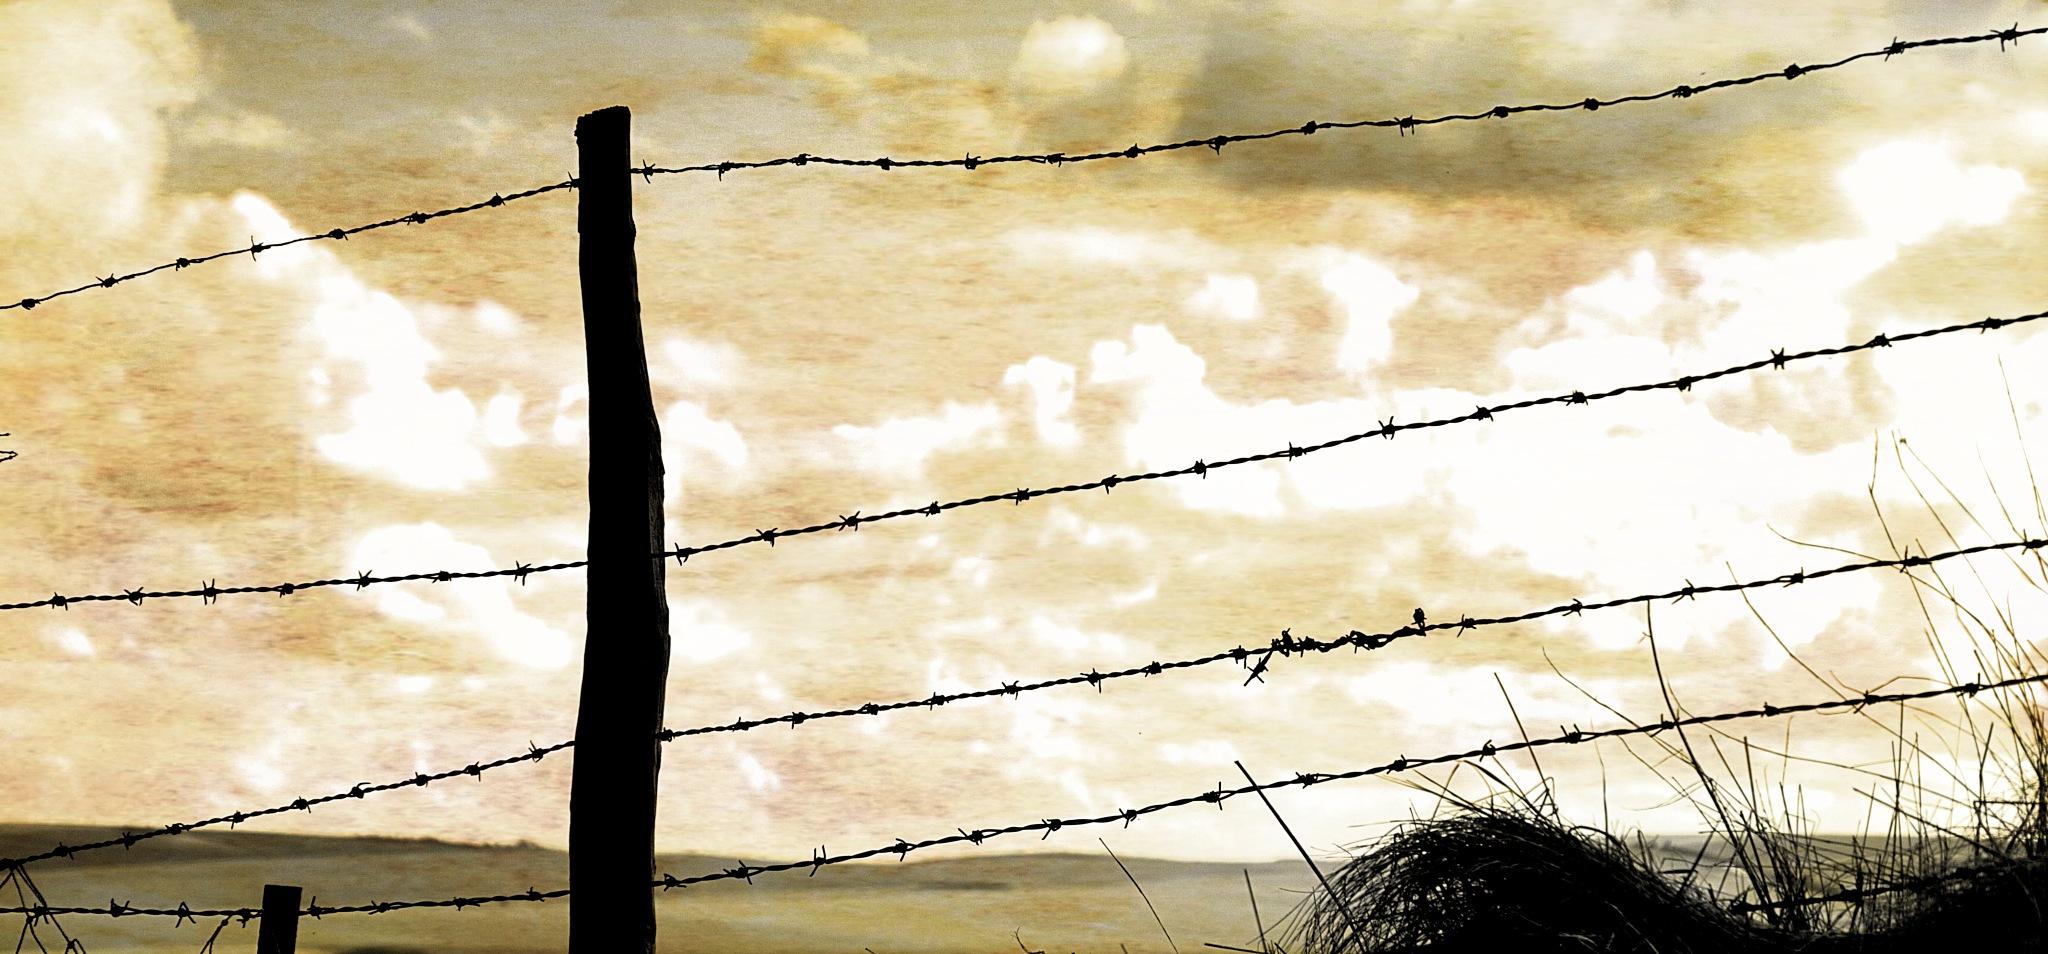 Wire Fence by Keith Patrak